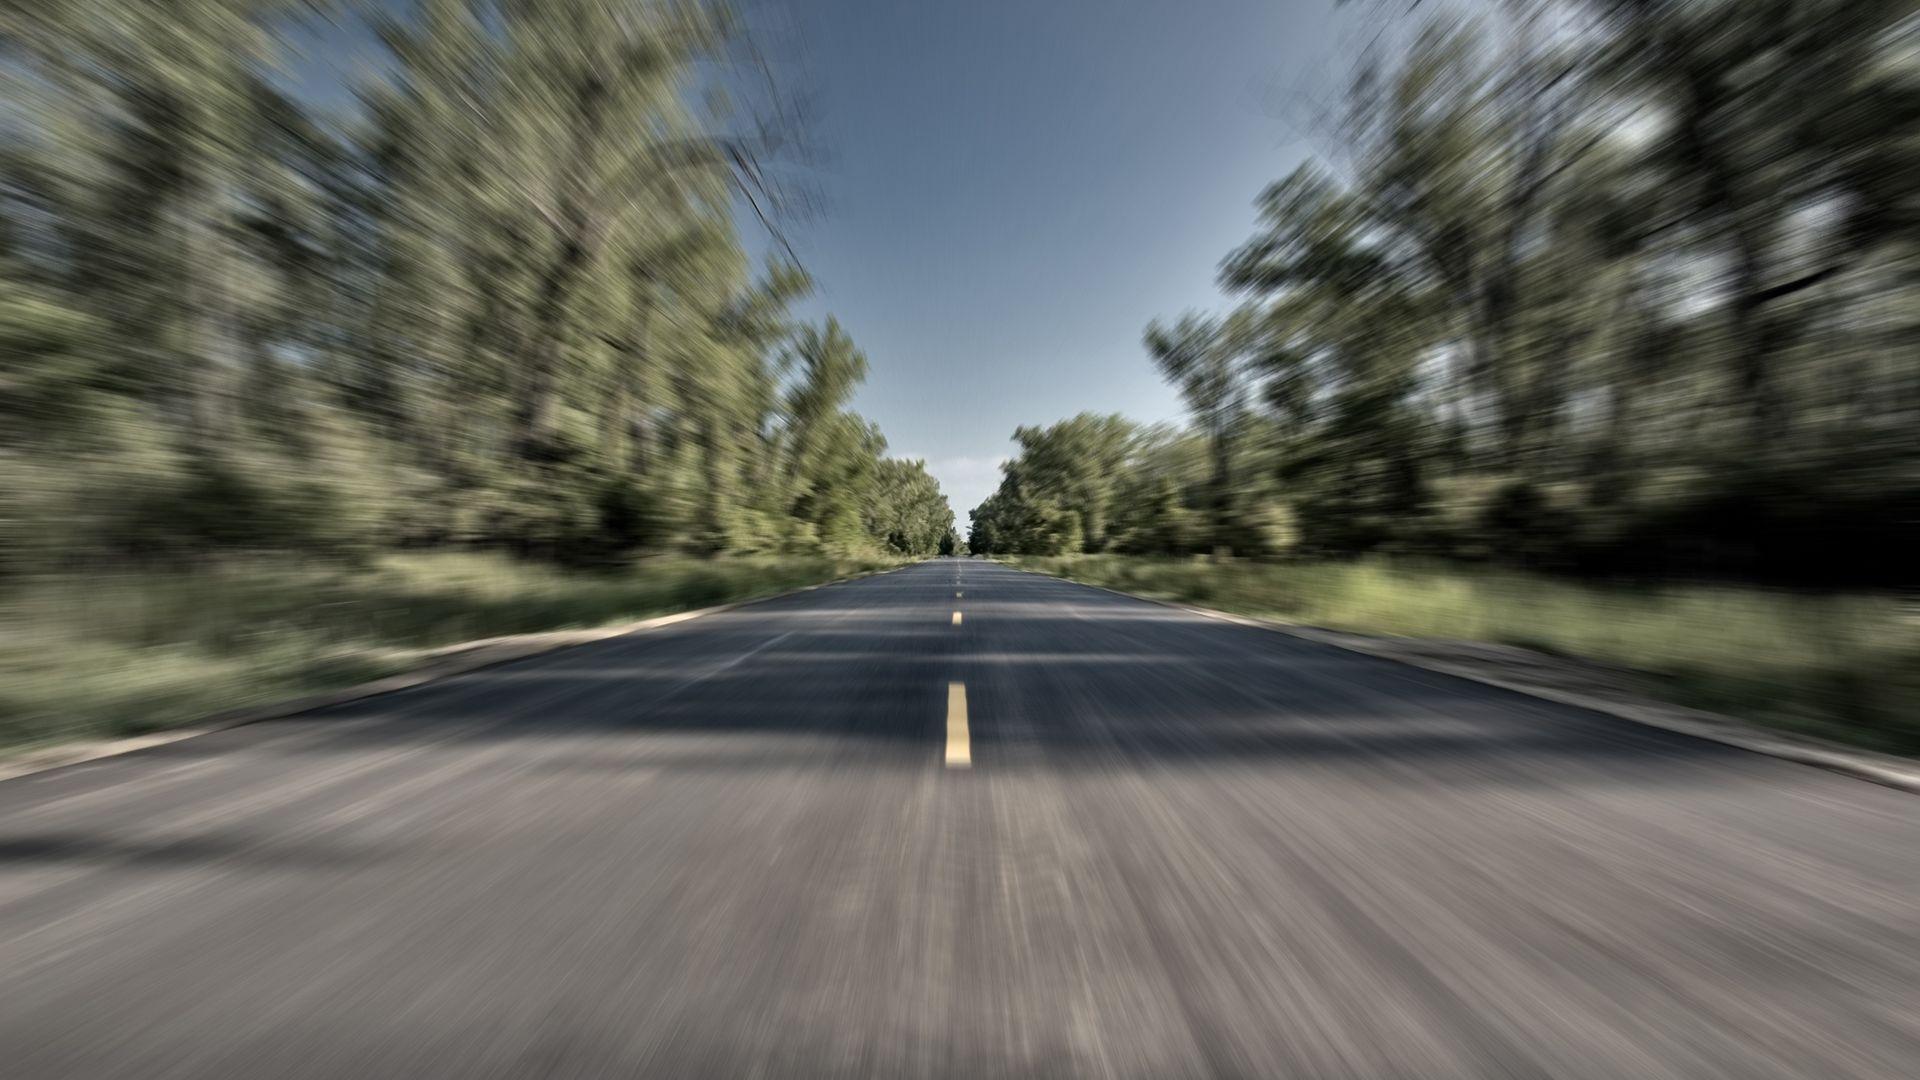 Empty Road Wallpapers #6787952